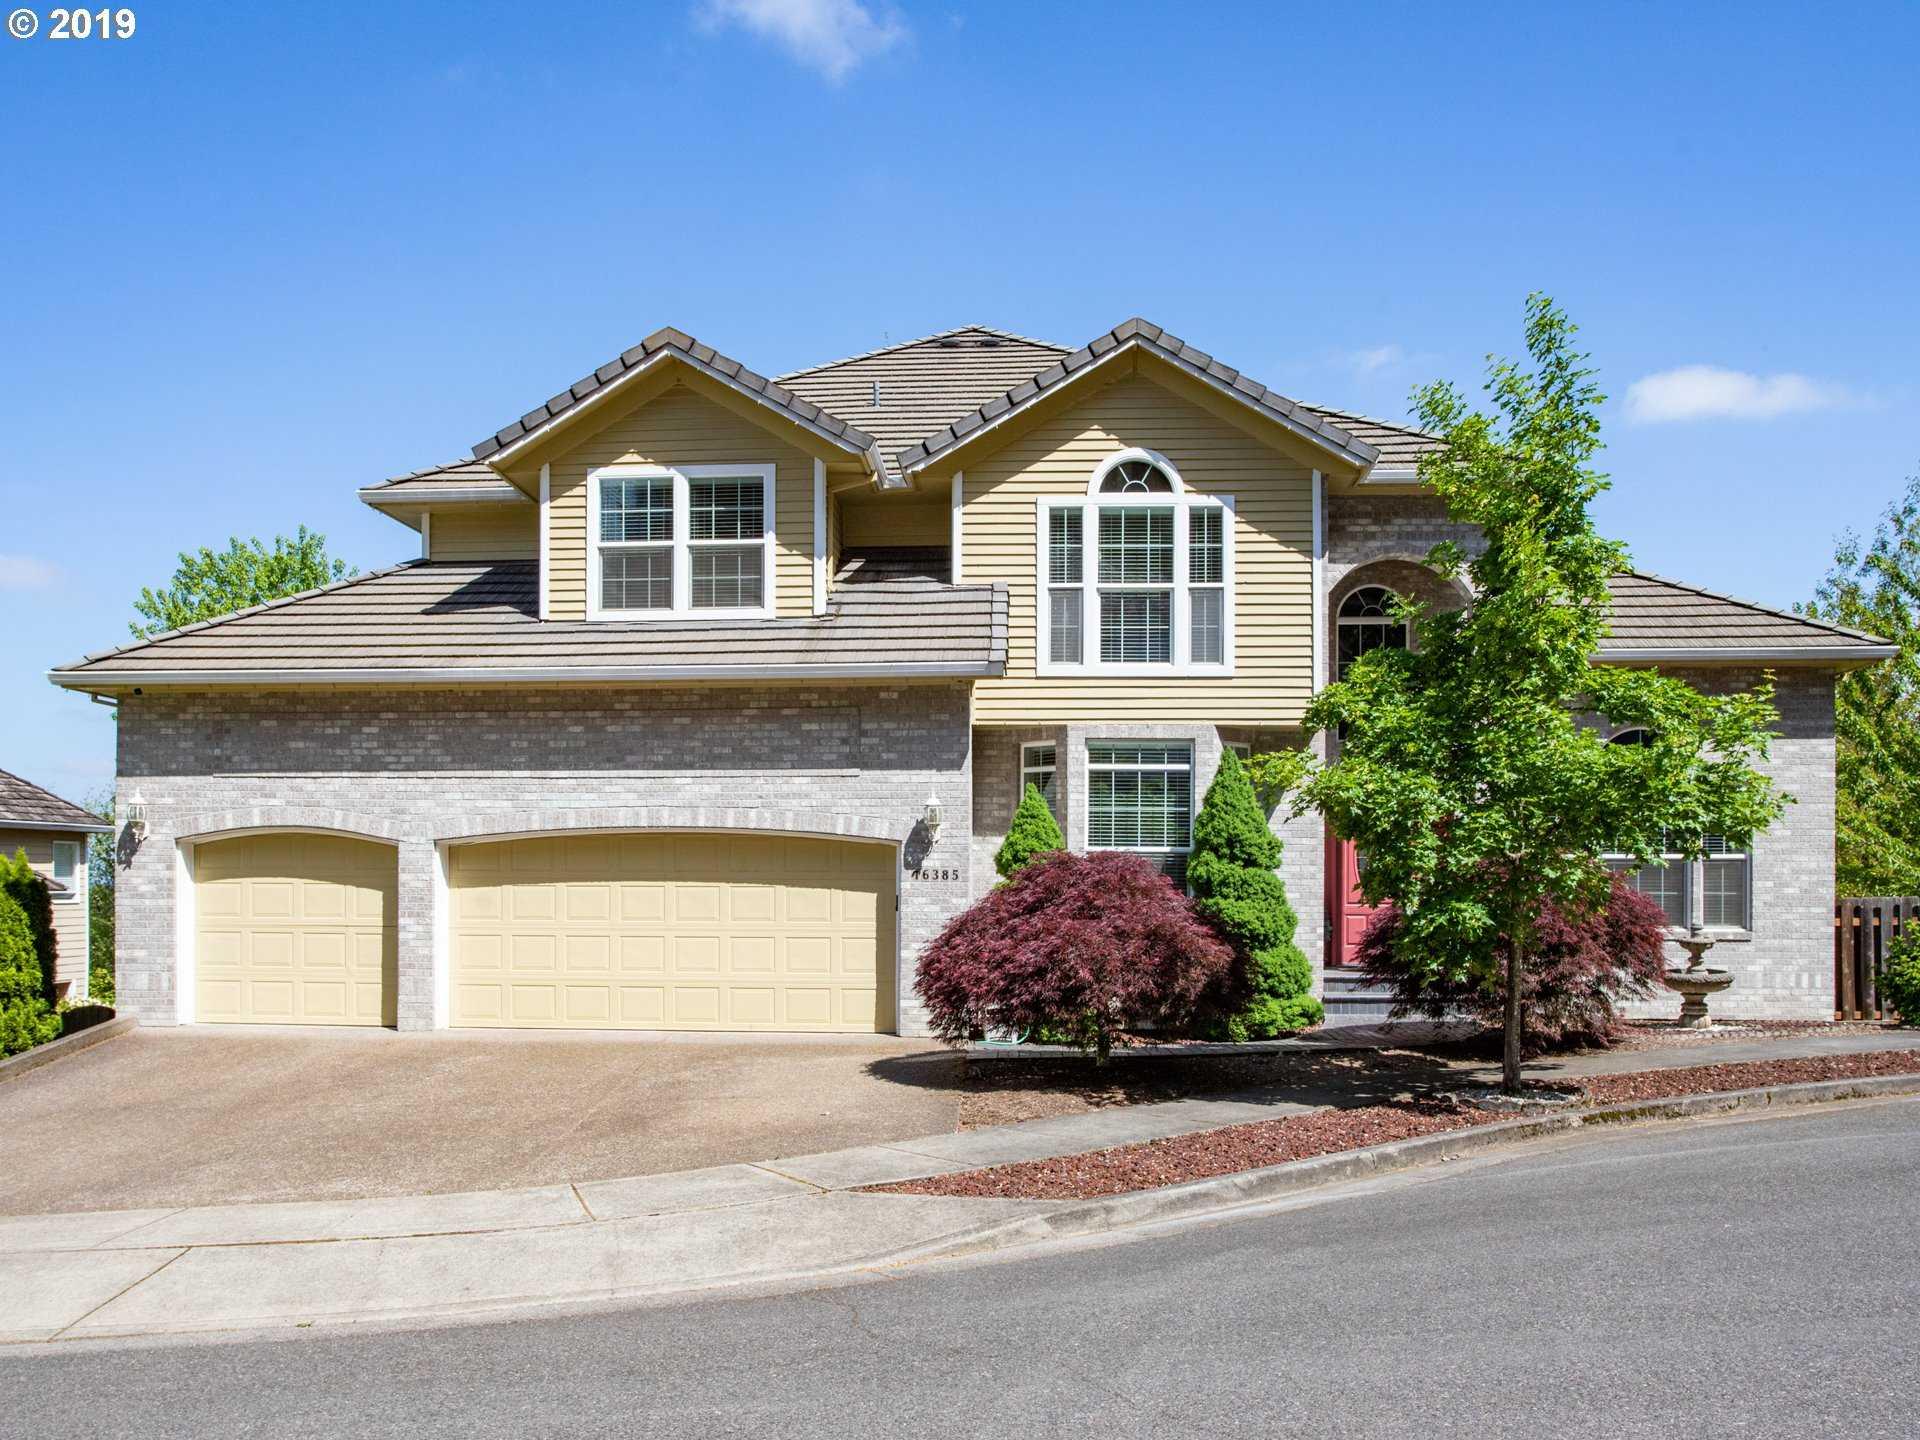 $985,000 - 9Br/8Ba -  for Sale in Beaverton